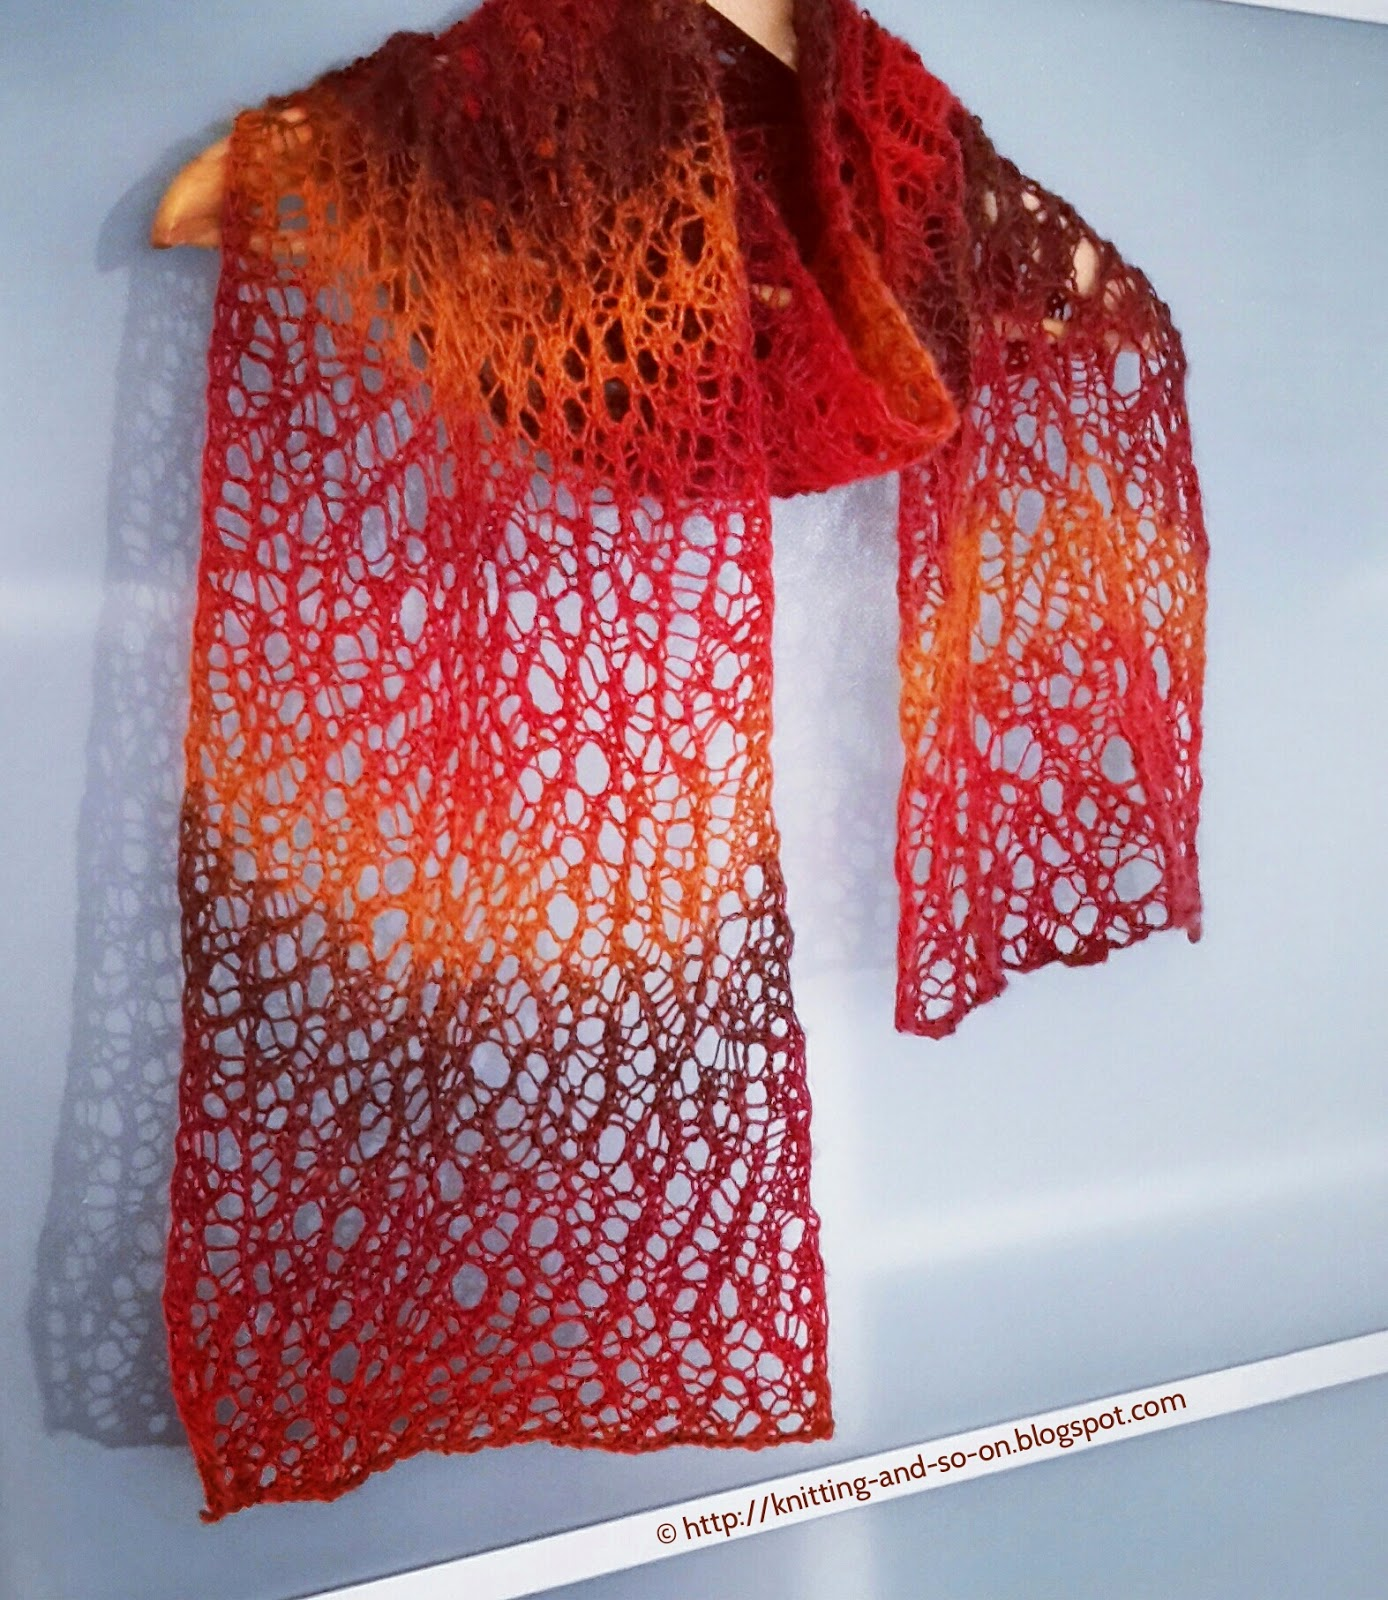 Knitting And So On Random Lace Scarf Winter Shawl Ws 06 Free Tutorial